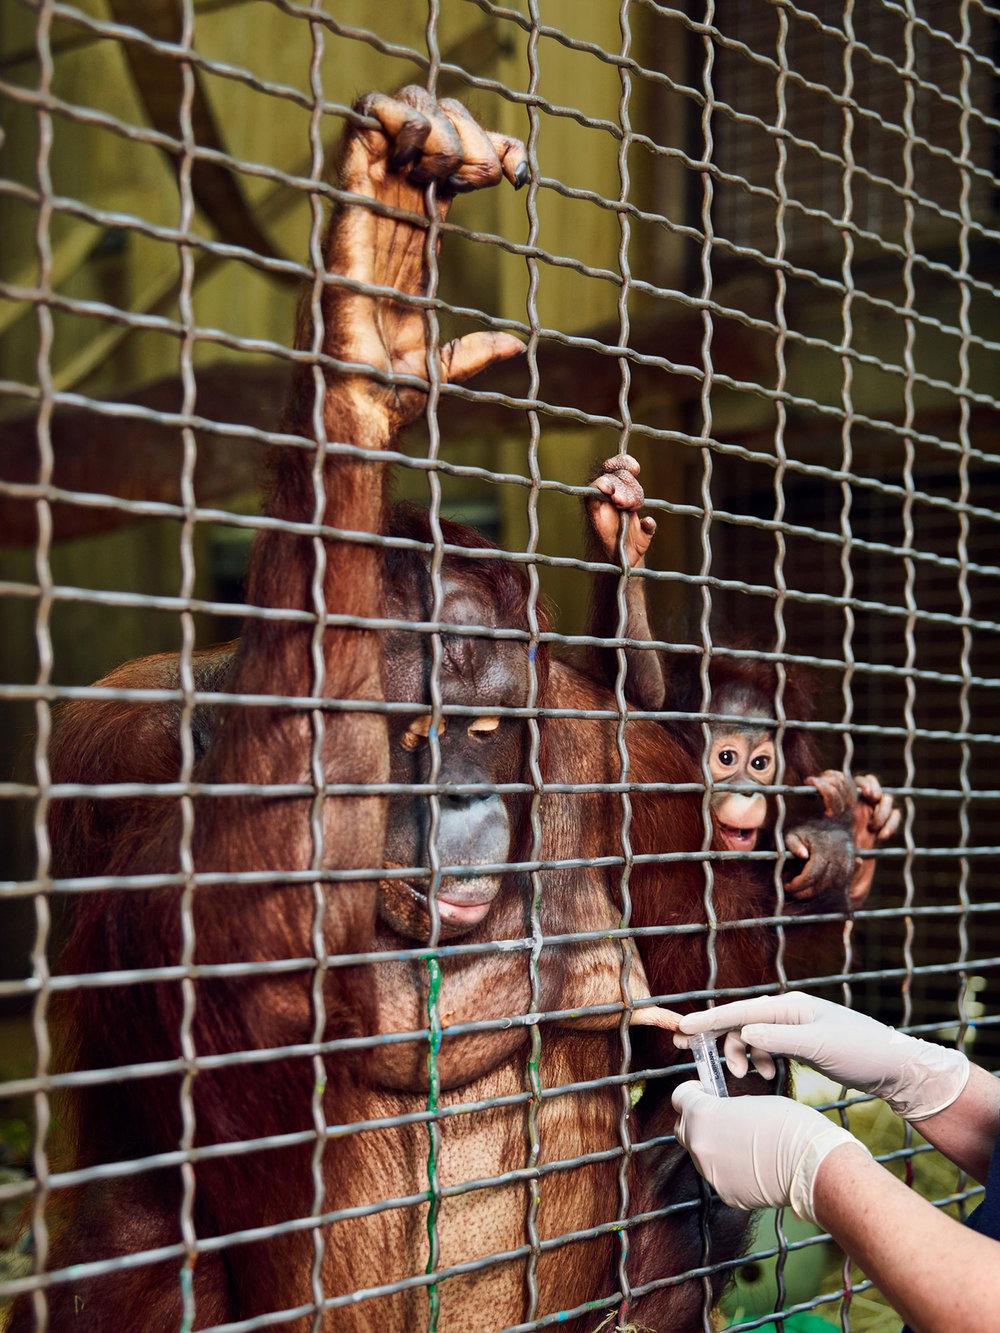 Critically Endangered Bornean Orangutan Named Batang Being Milked For The Exotic-Animal Milk Bank, Washington